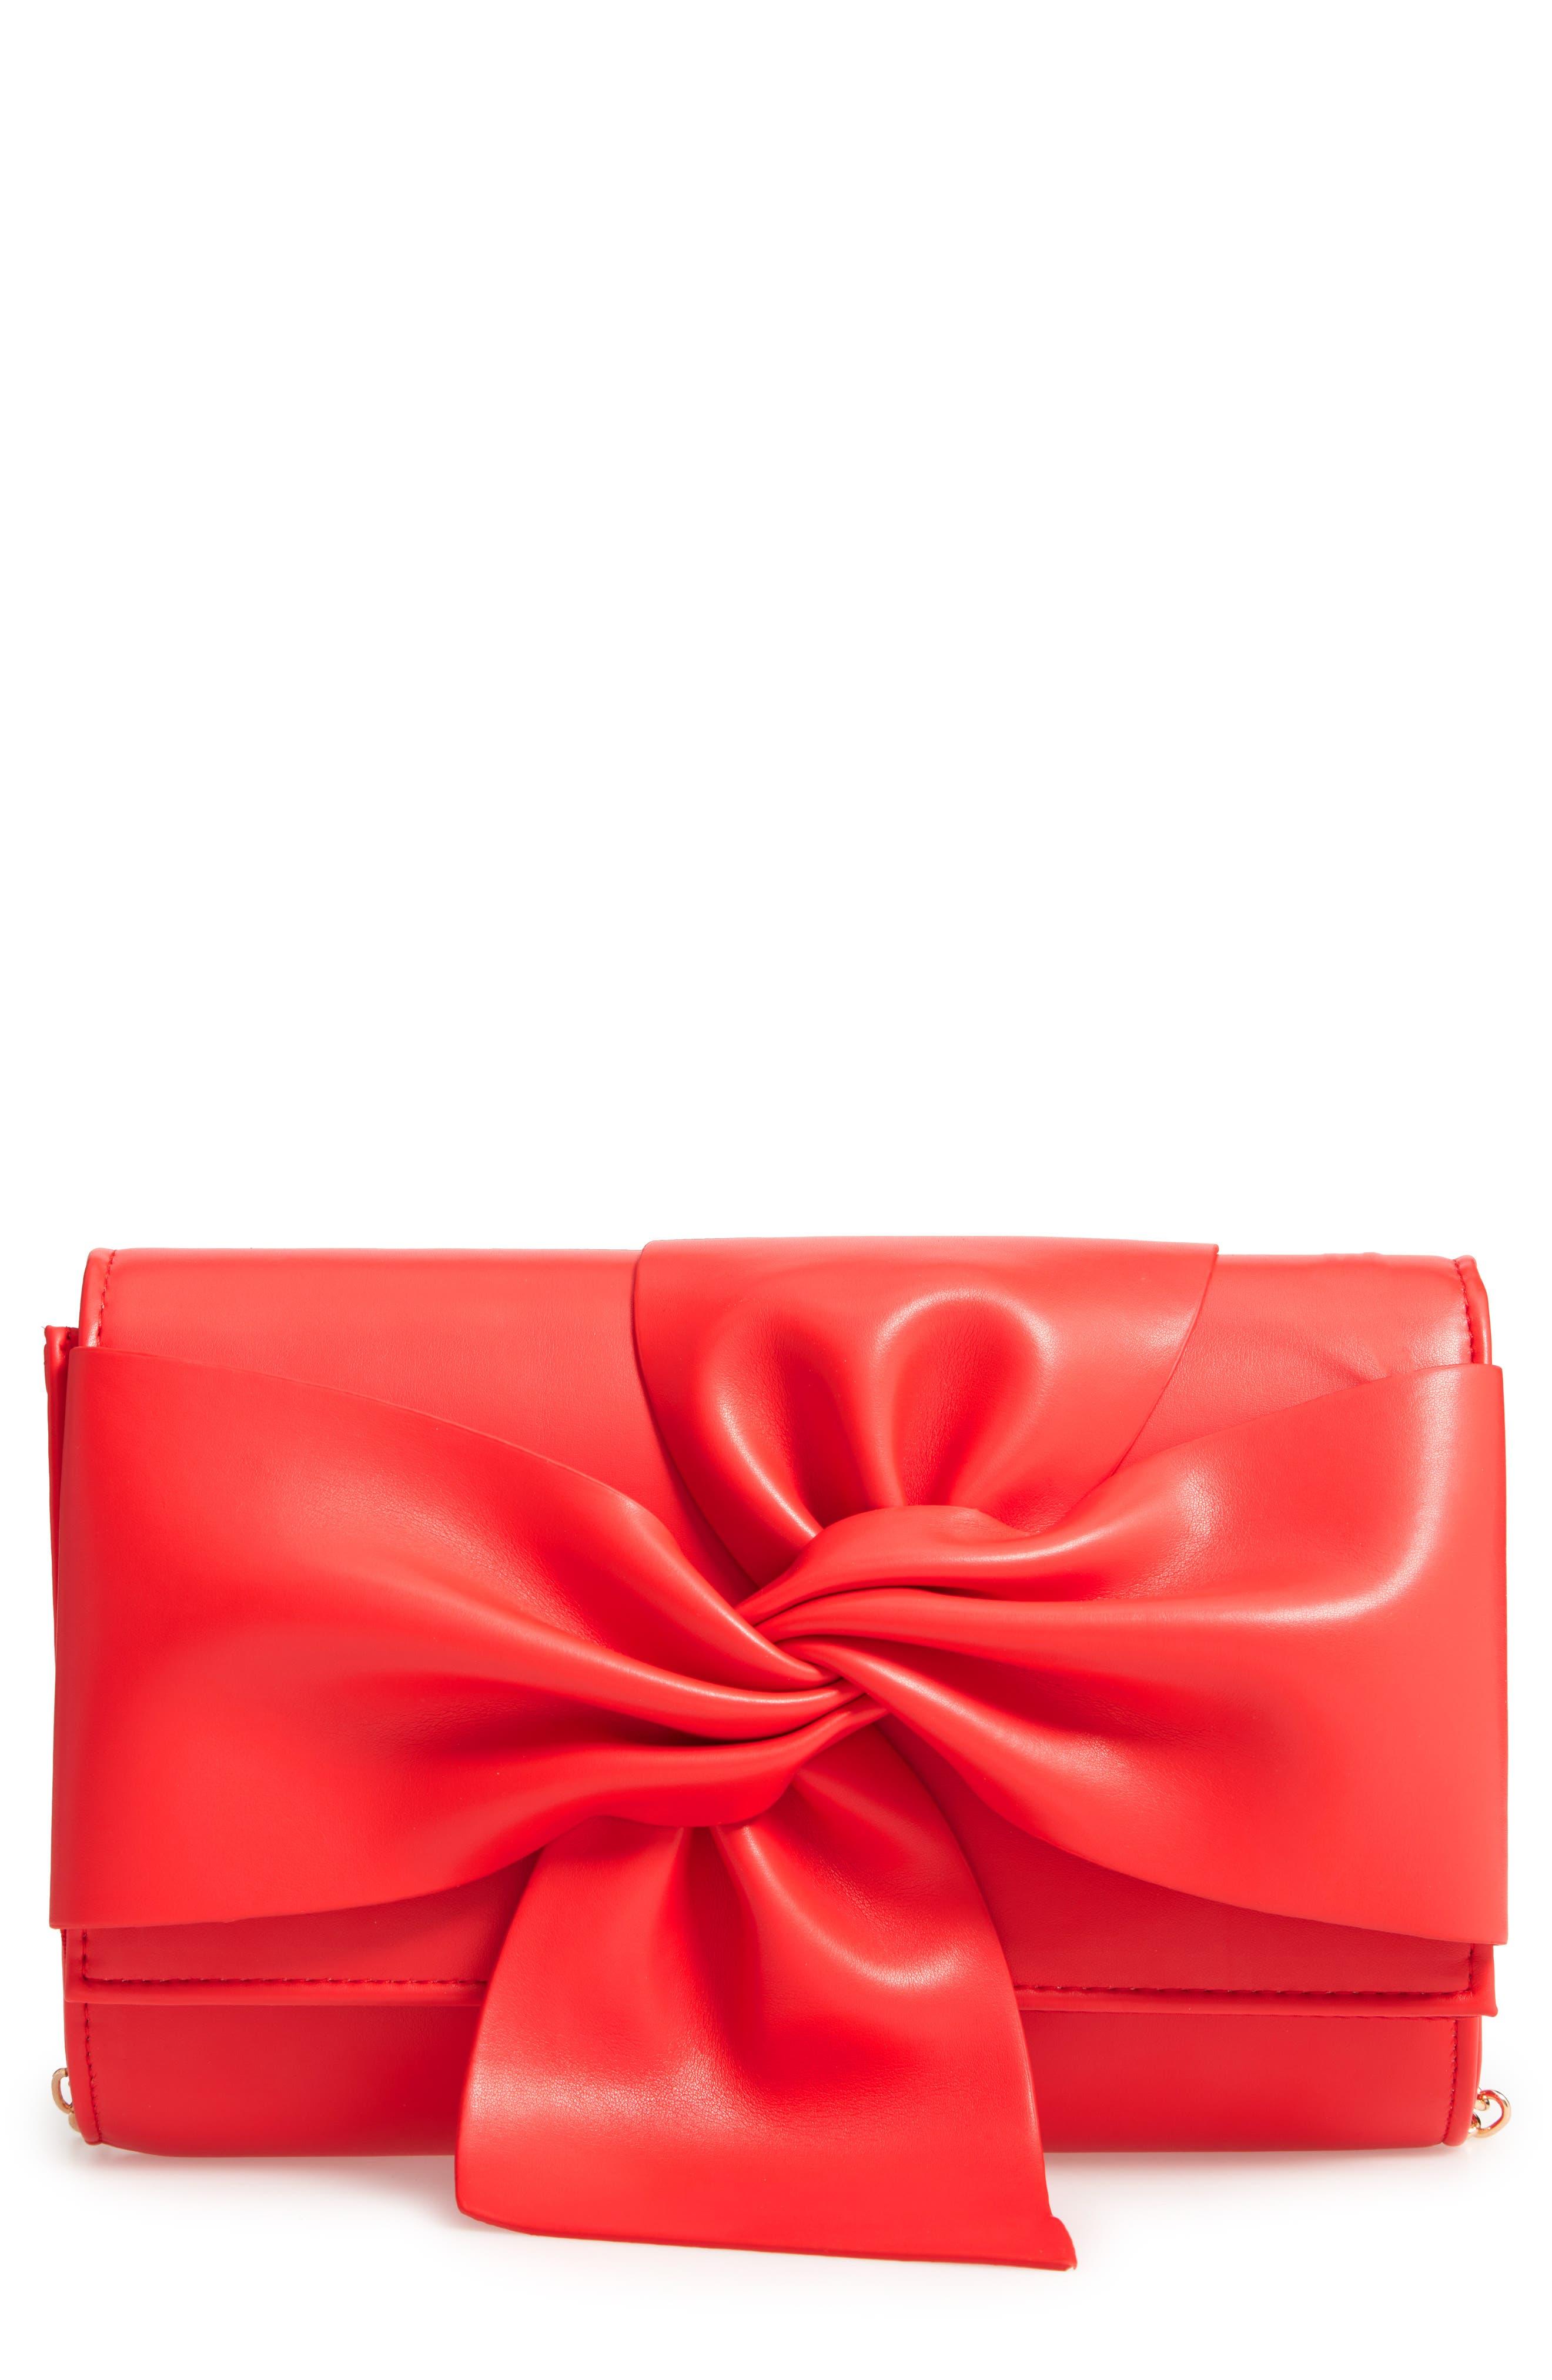 982bf93ab25d Street Level Handbags   Wallets for Women